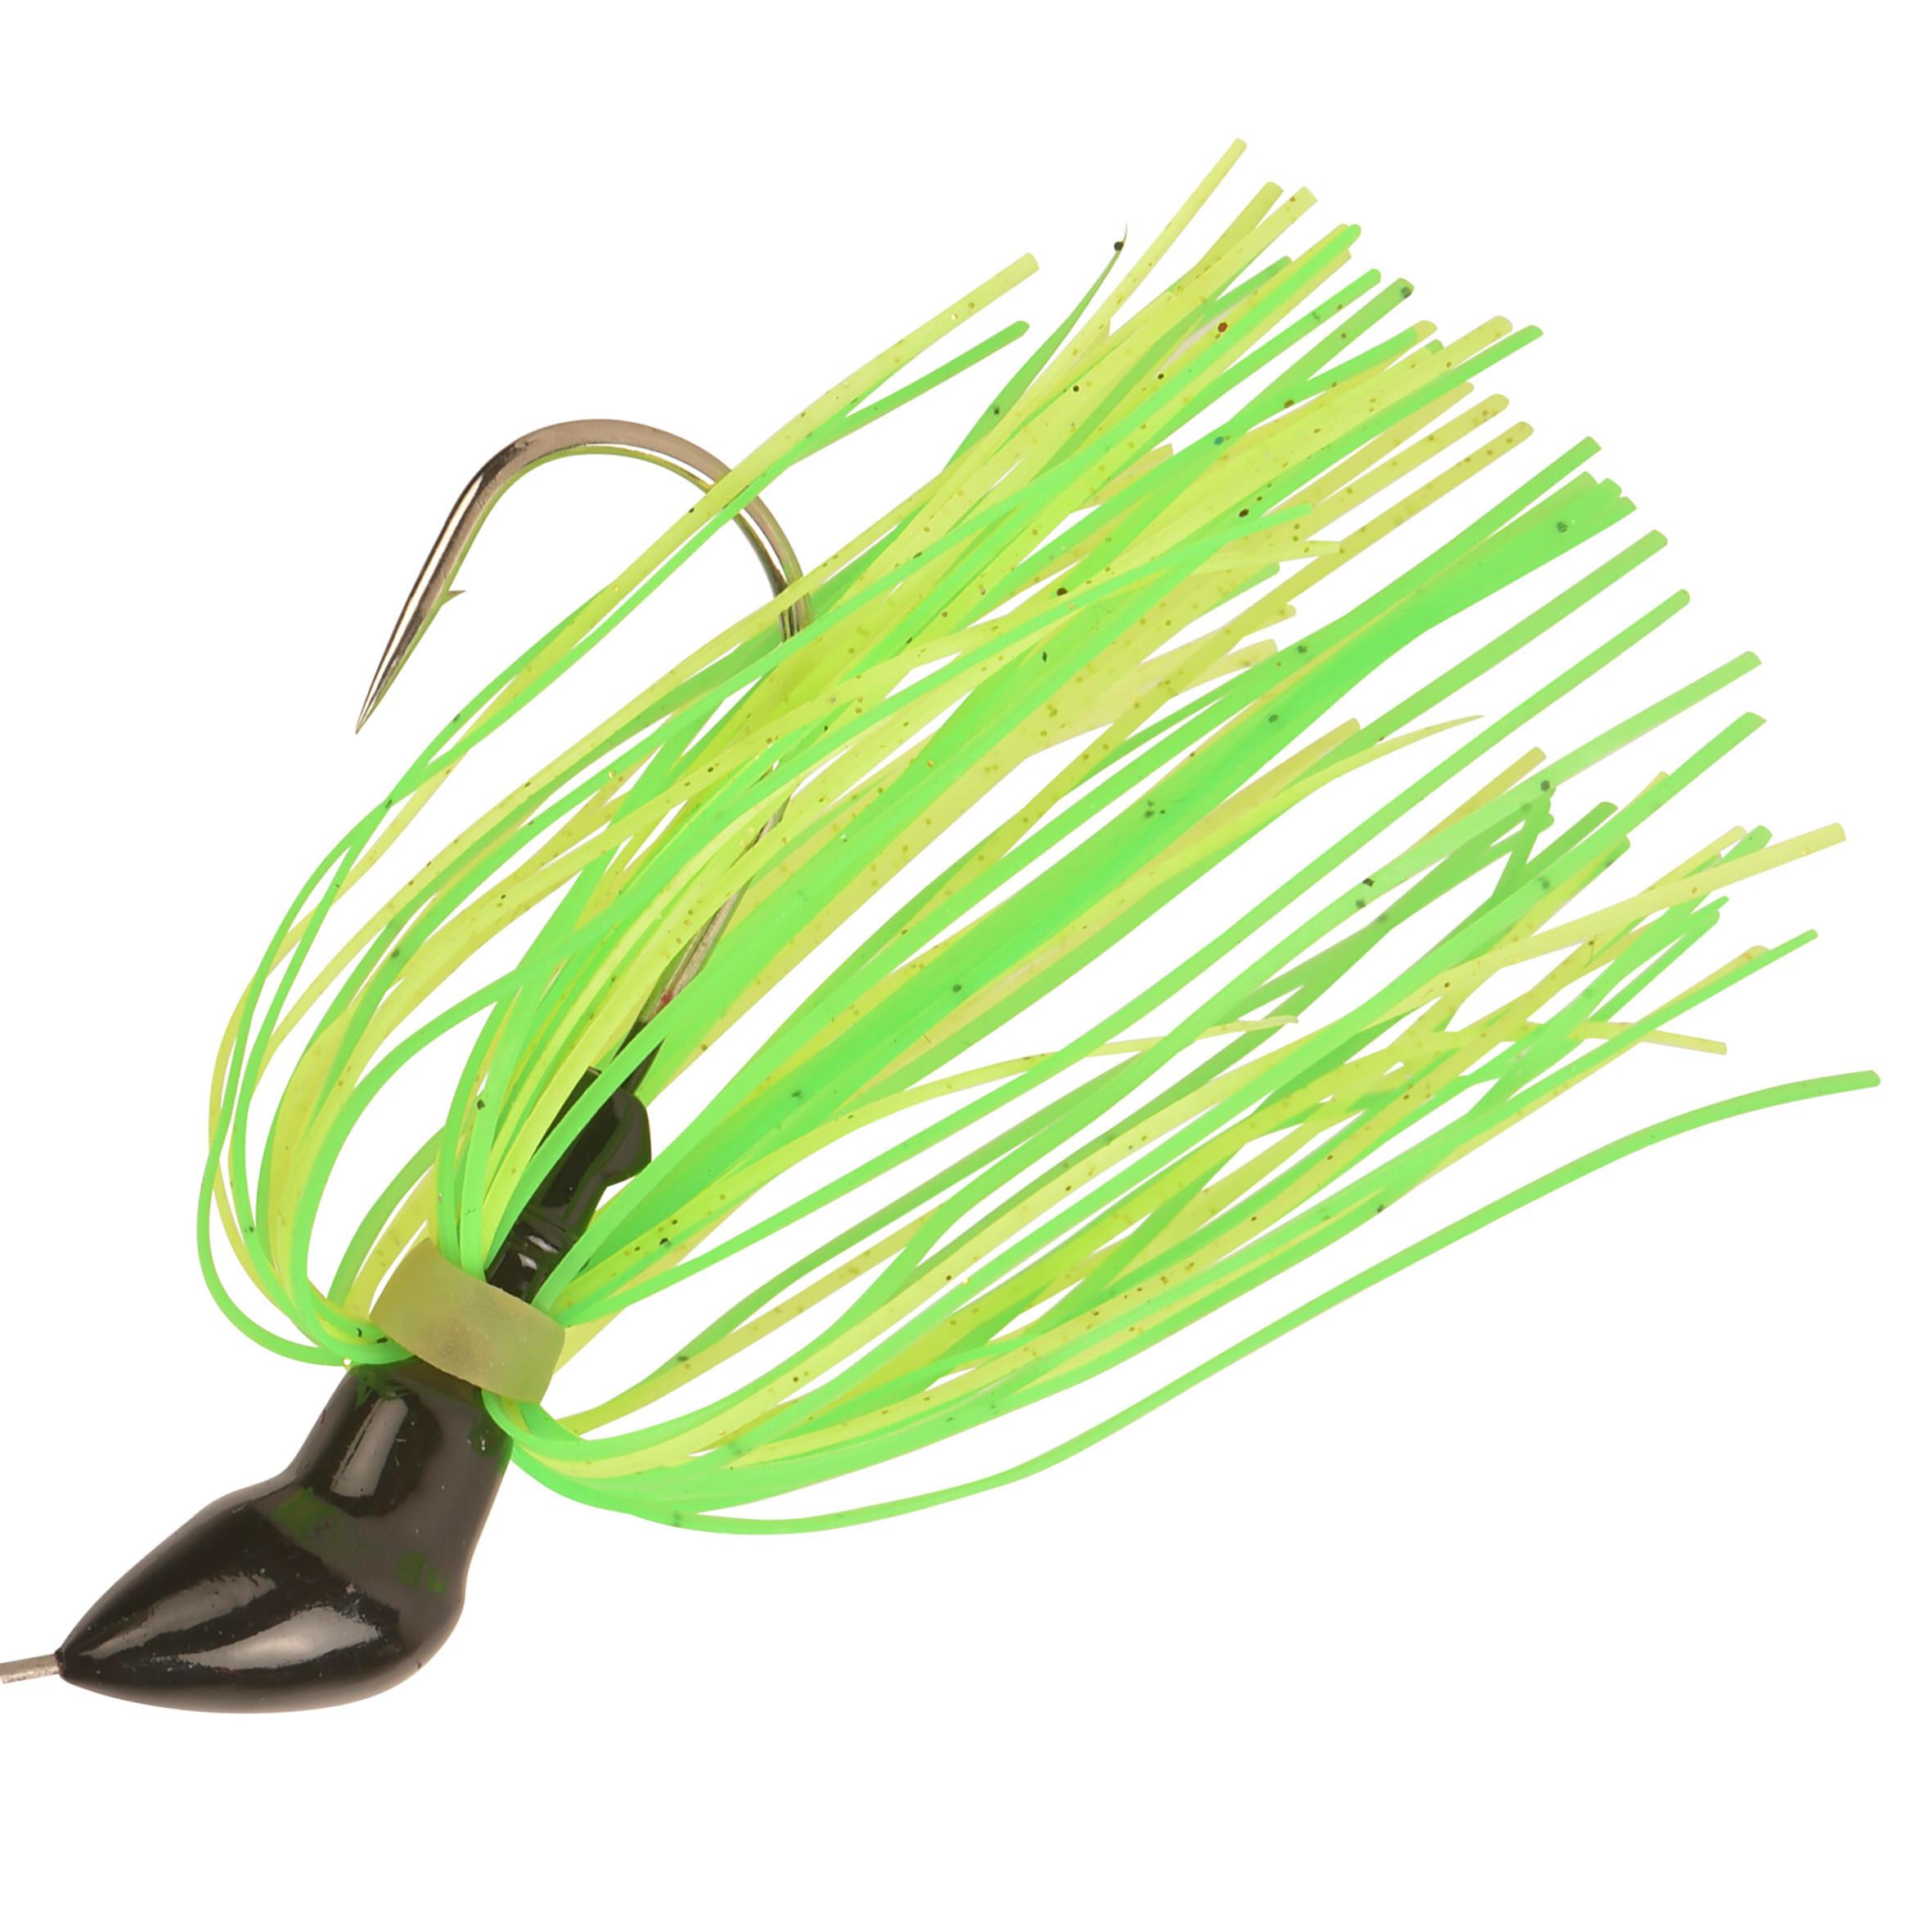 Spinnerbait pêche aux leurres buckhan 16gr jaune vert caperlan